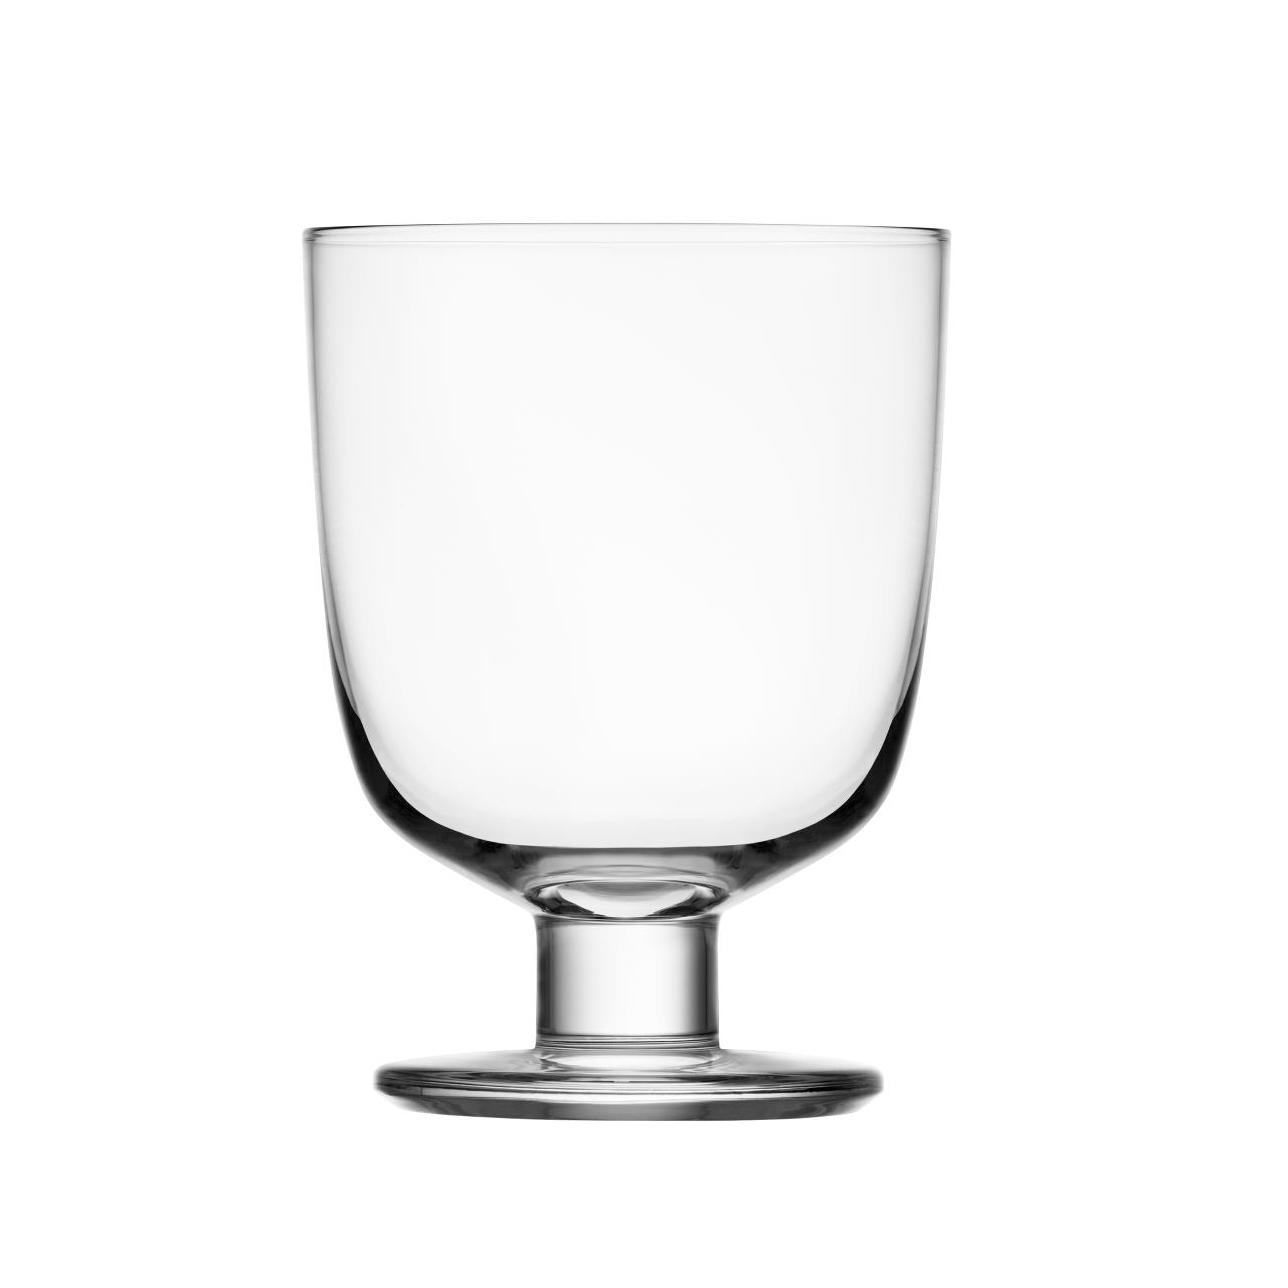 Lempi_glass_34cl_clear